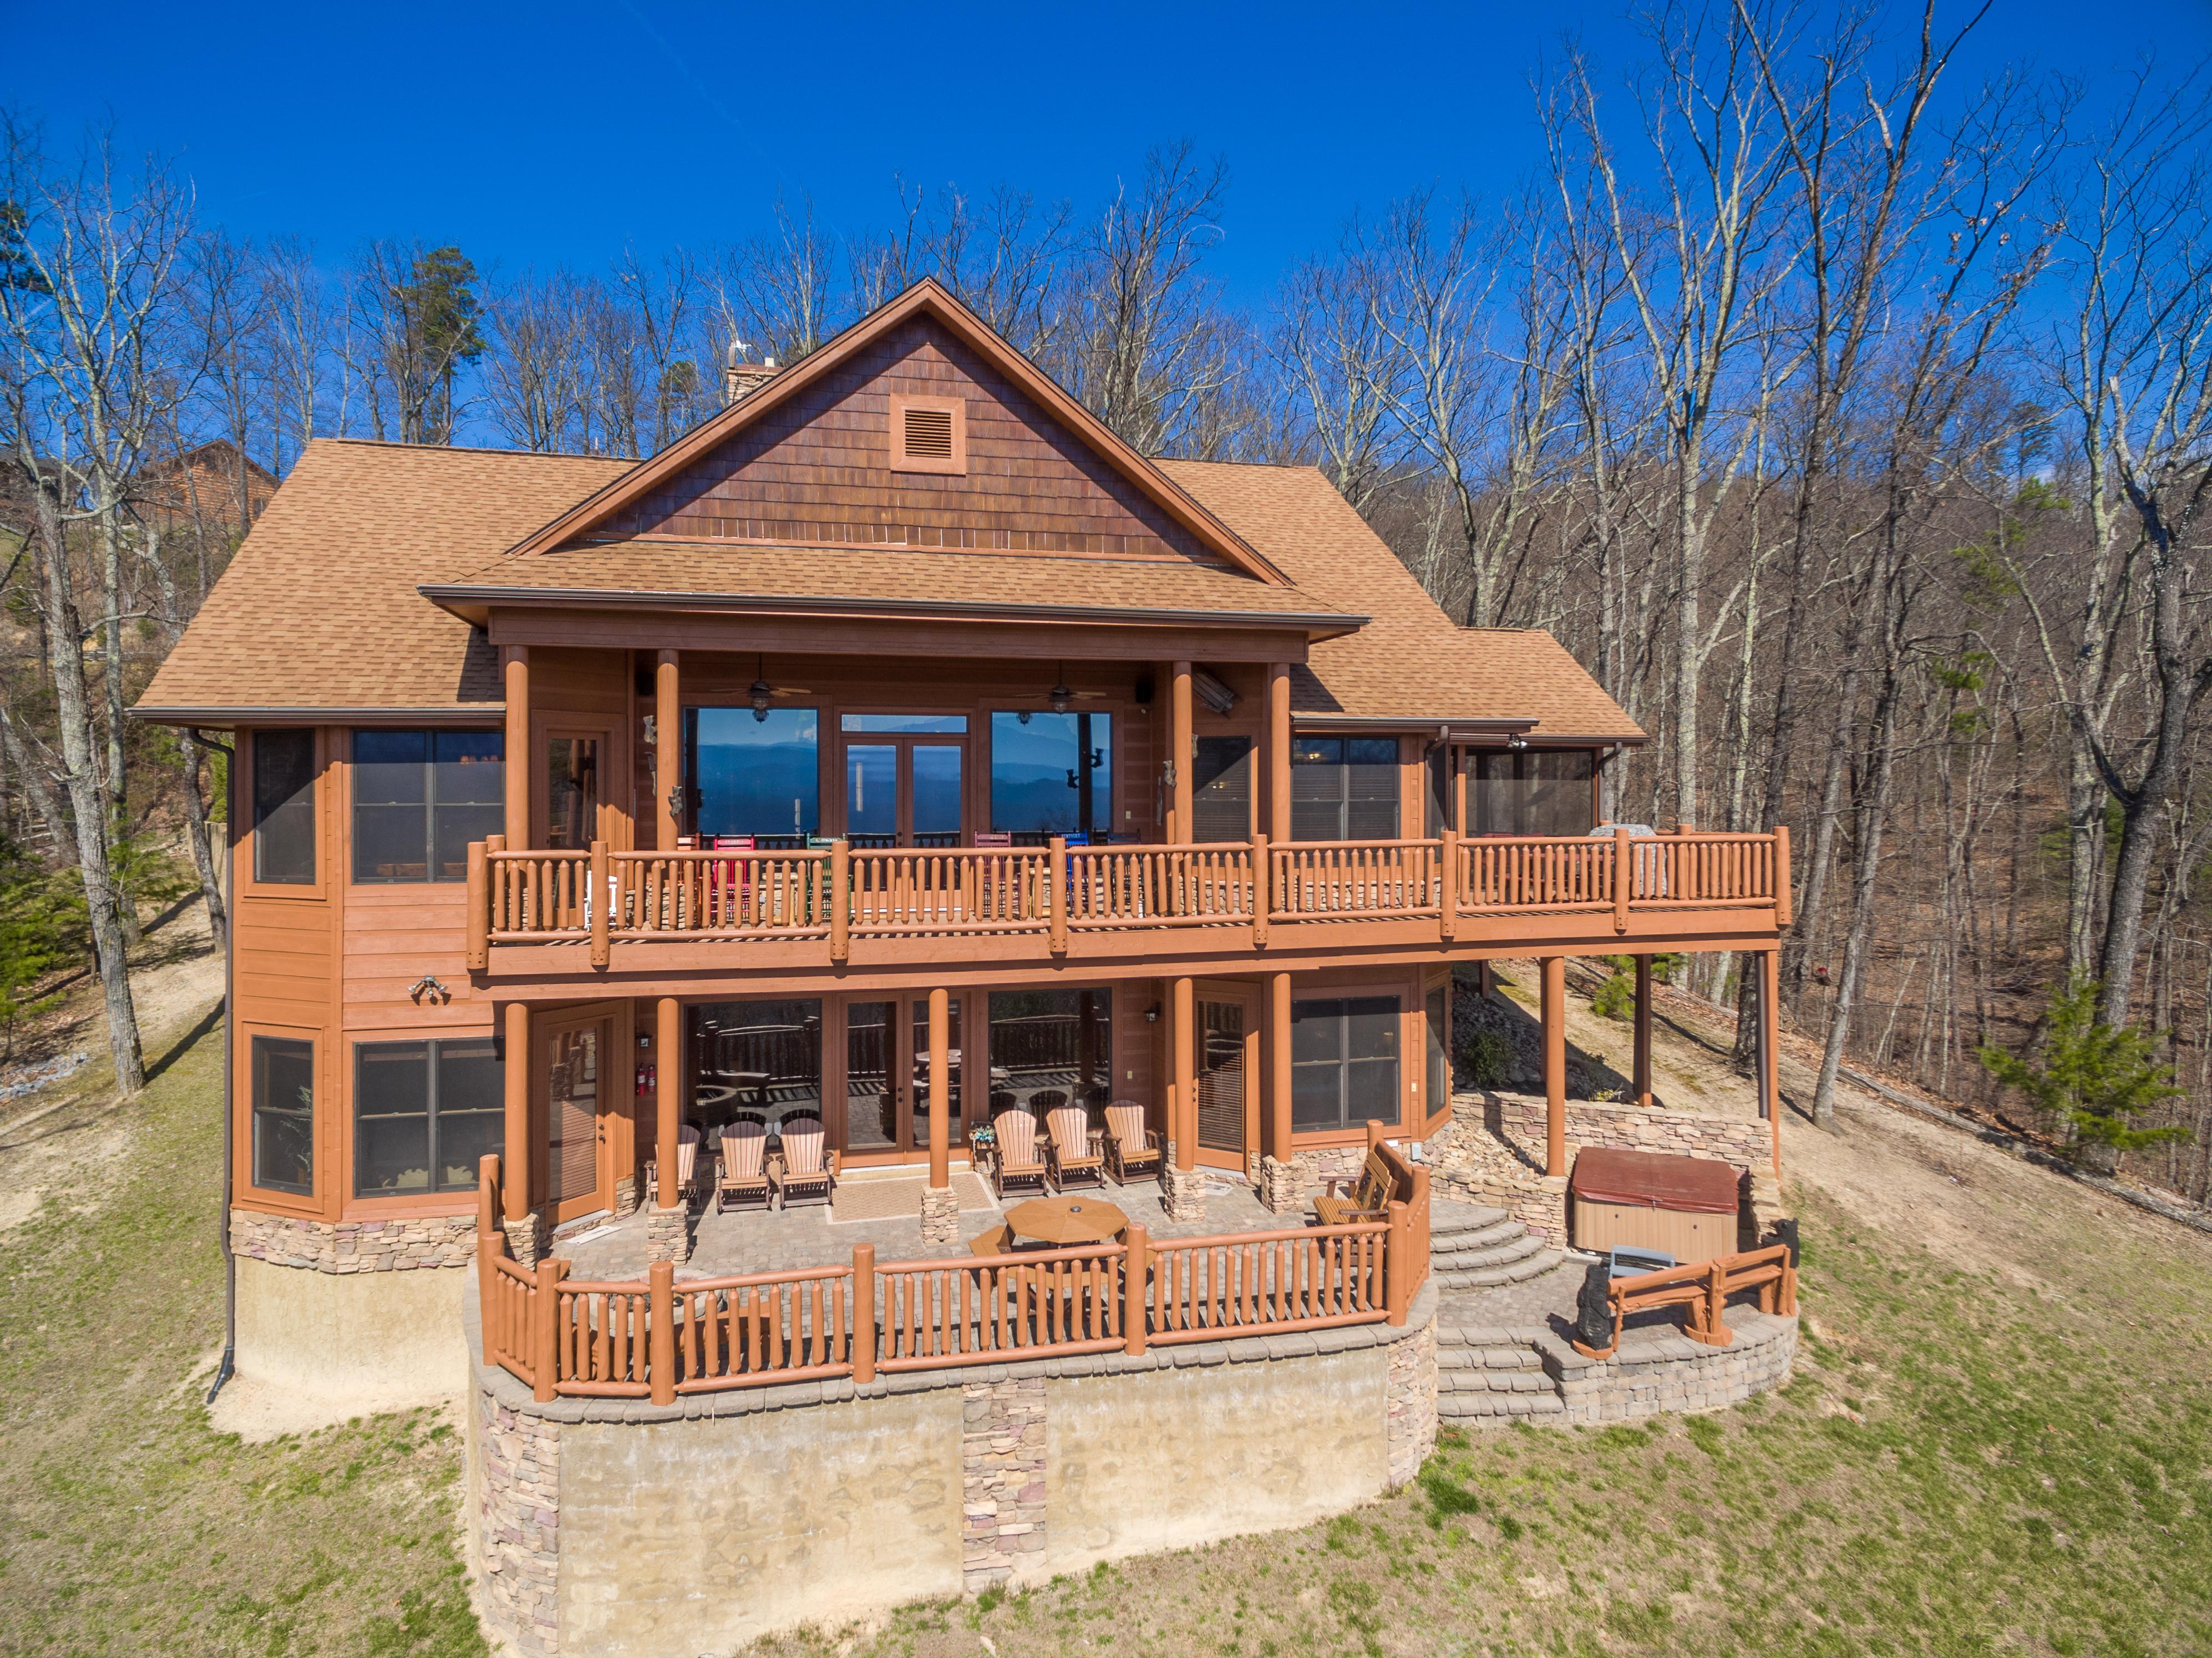 gatlinburg online forge img s for bedroom edge sleeps pigeon cabin waterfall cabins pictures rental